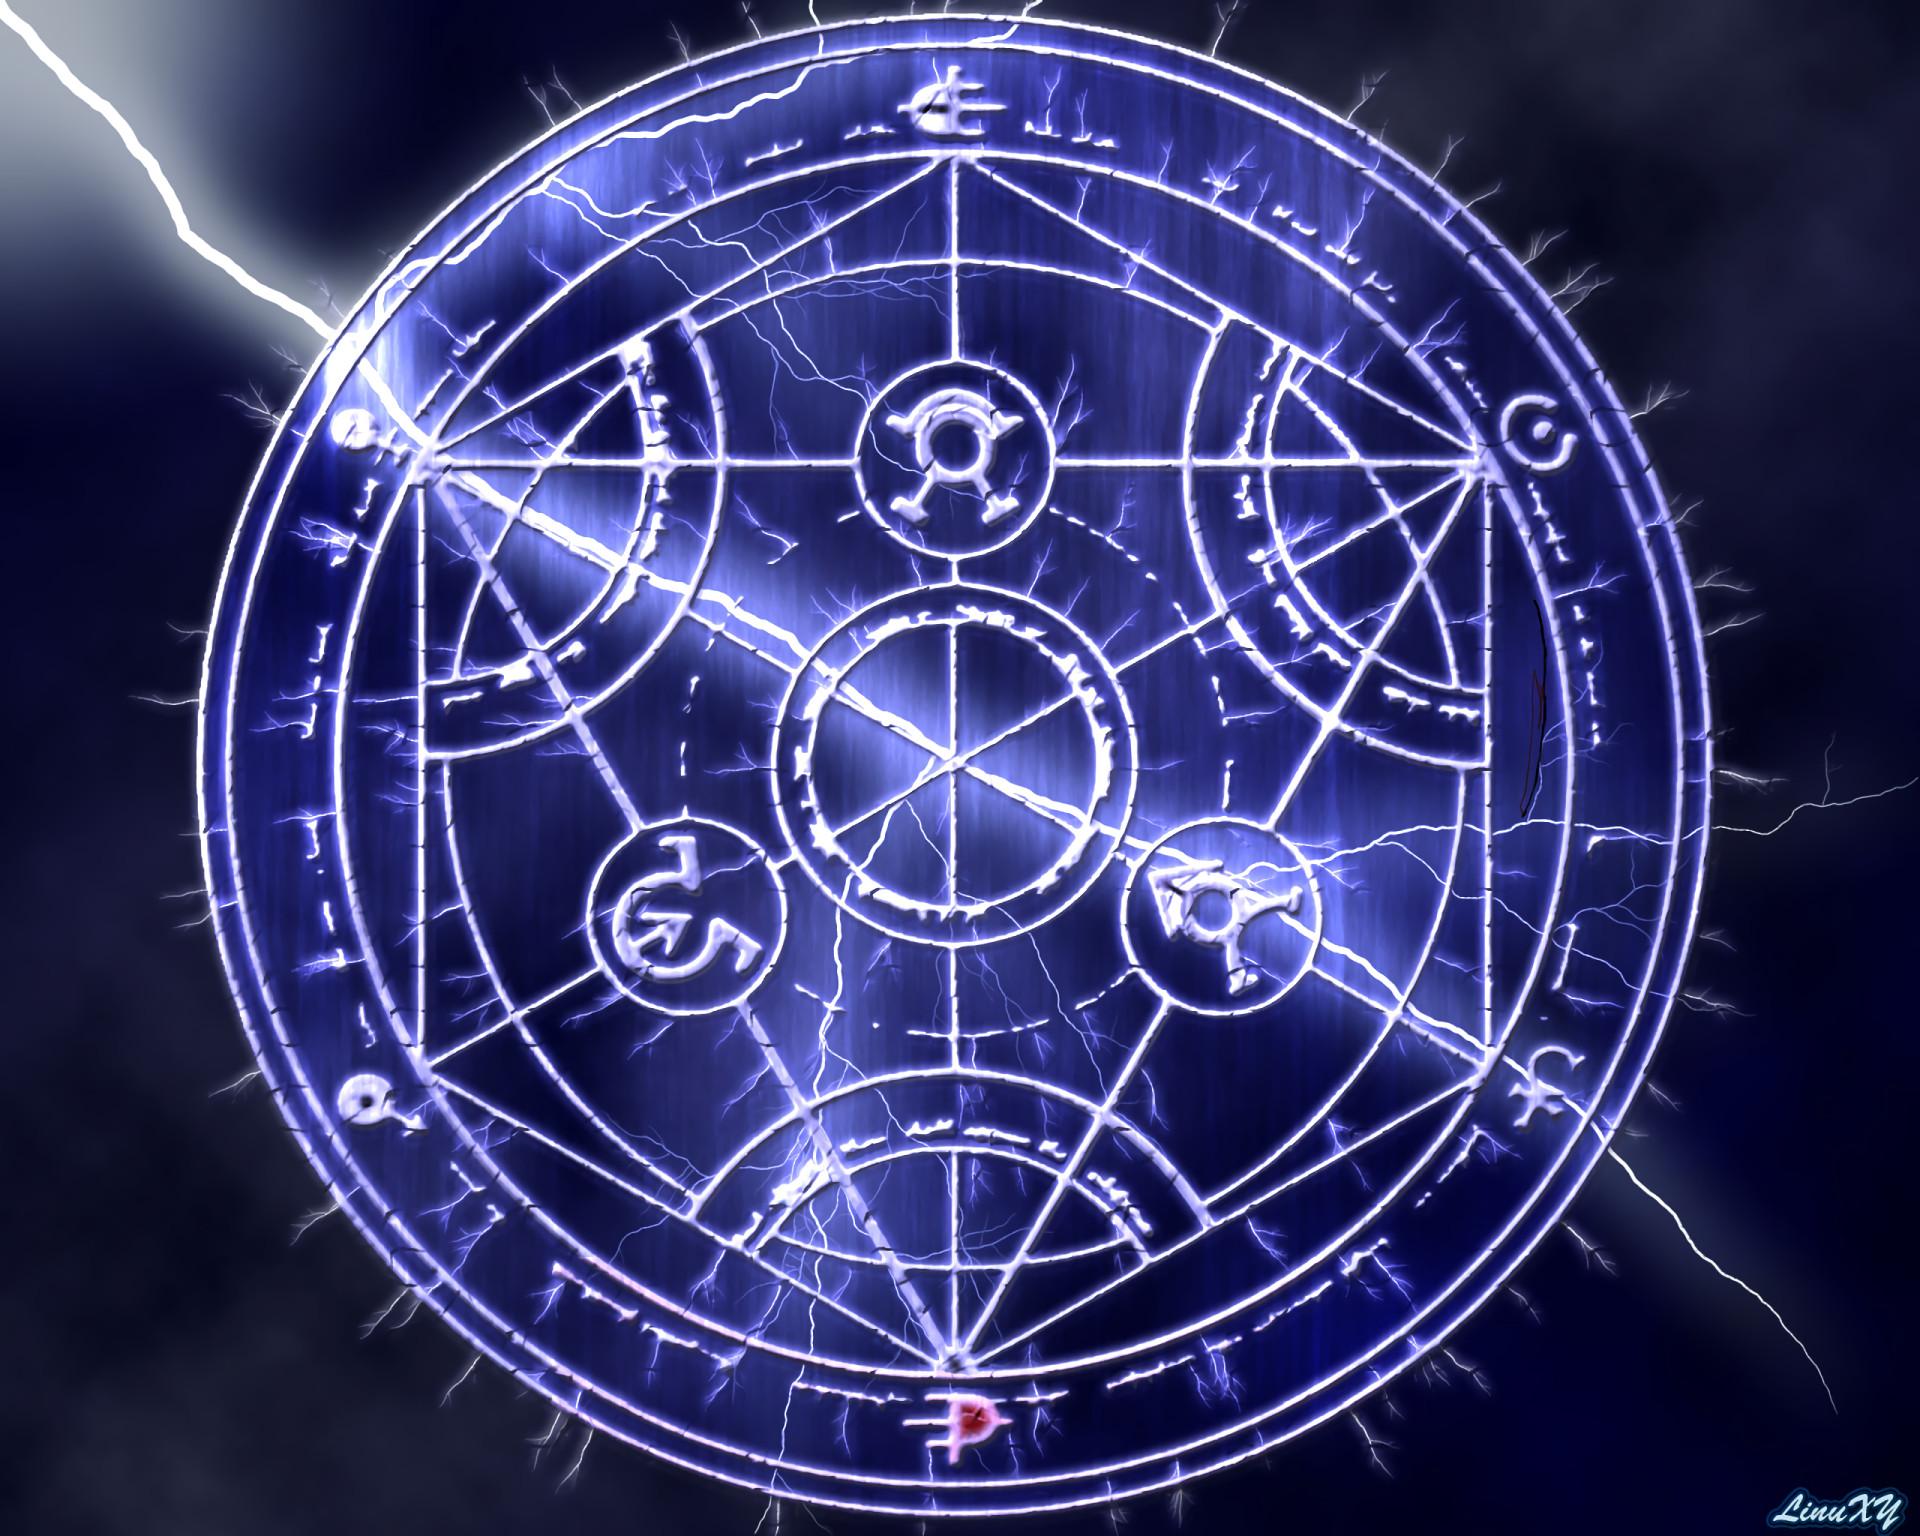 1512919-best-fullmetal-alchemist-phone-wallpaper-1920x1536.jpg